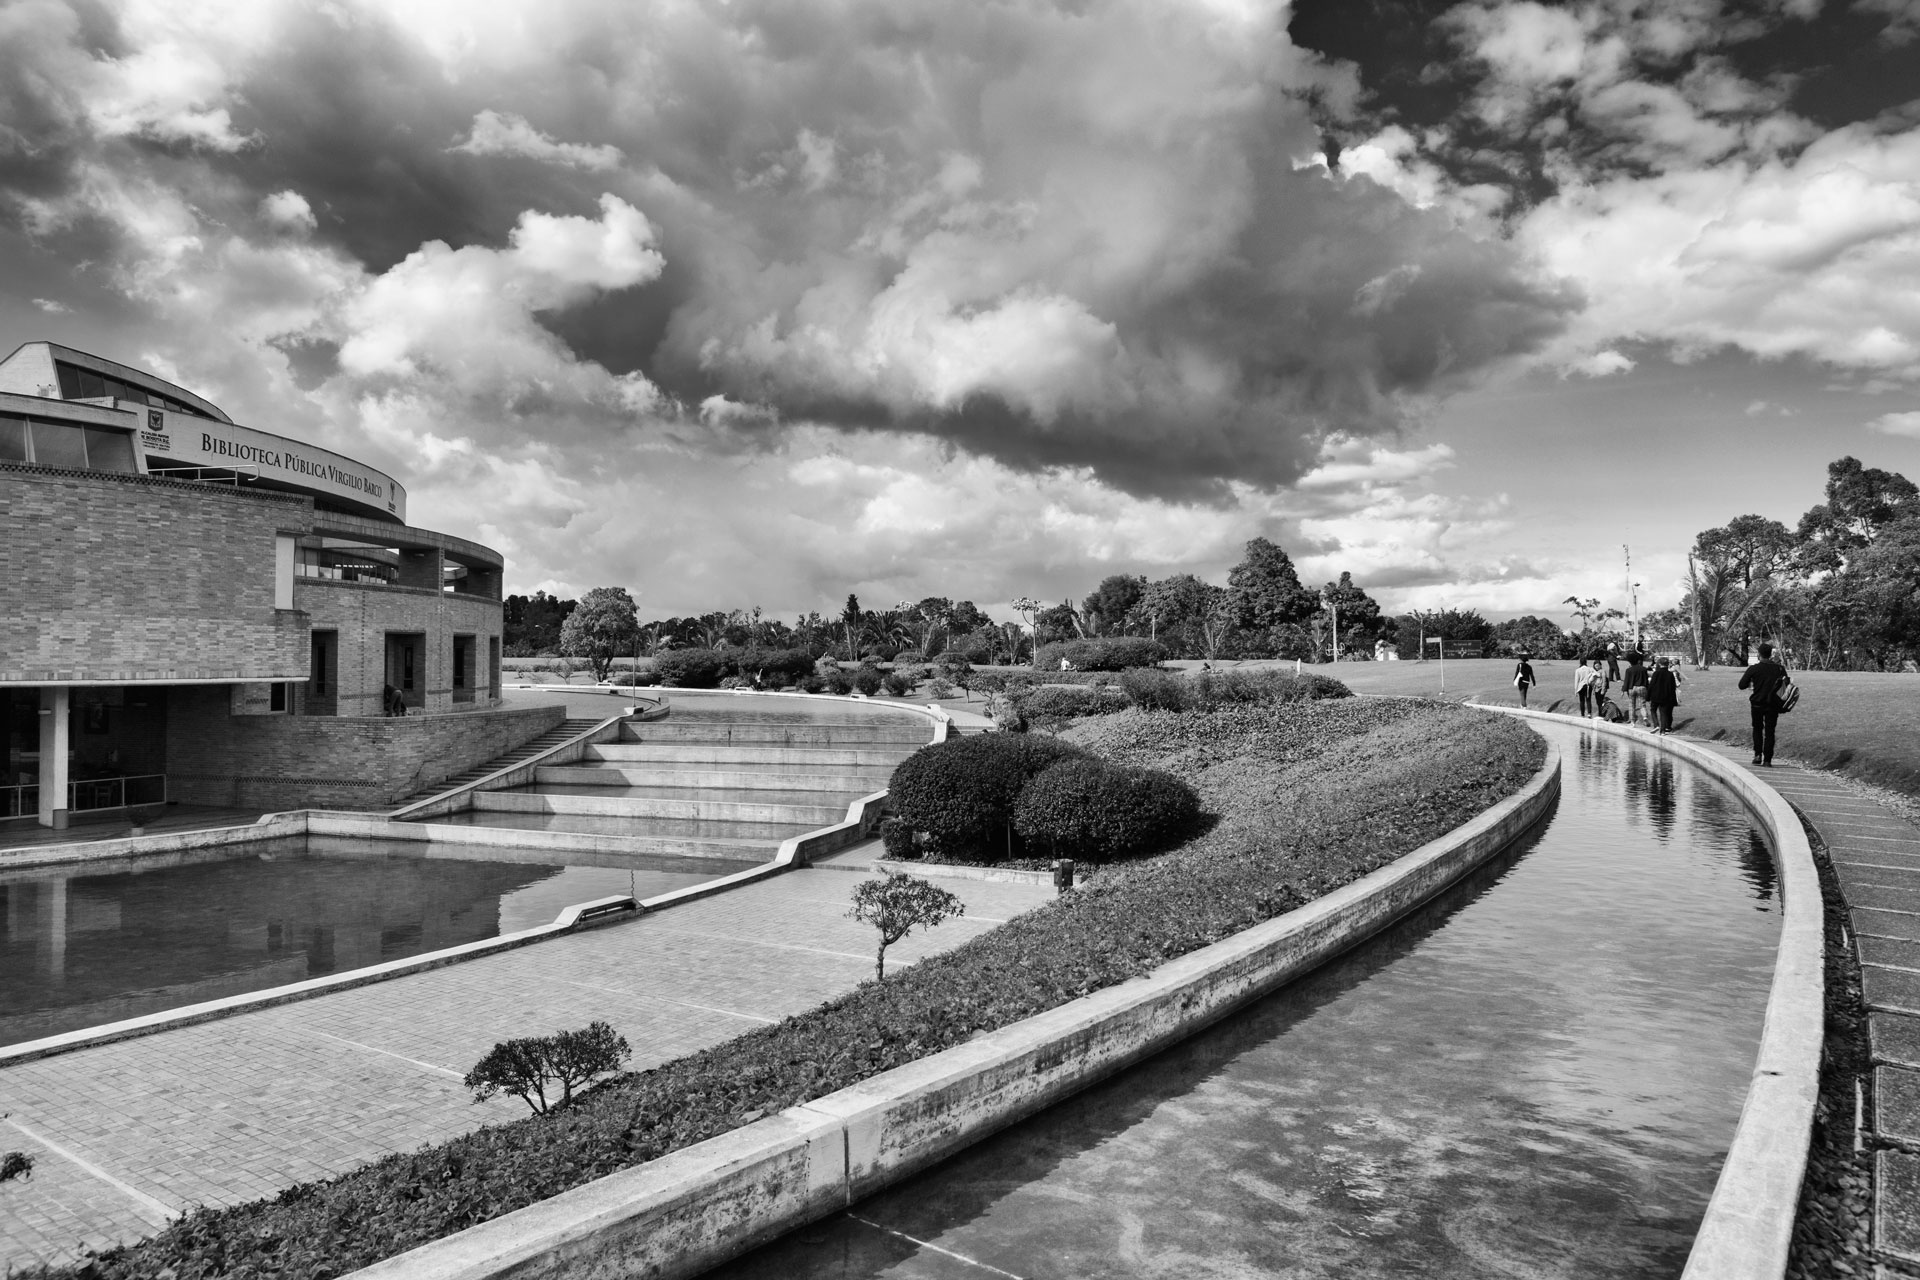 03-simonbosch photography-simon-bosch-architectuur-architecture-bogota-colombia-ArchDaily-Biblioteca Publica Virgilio Barco